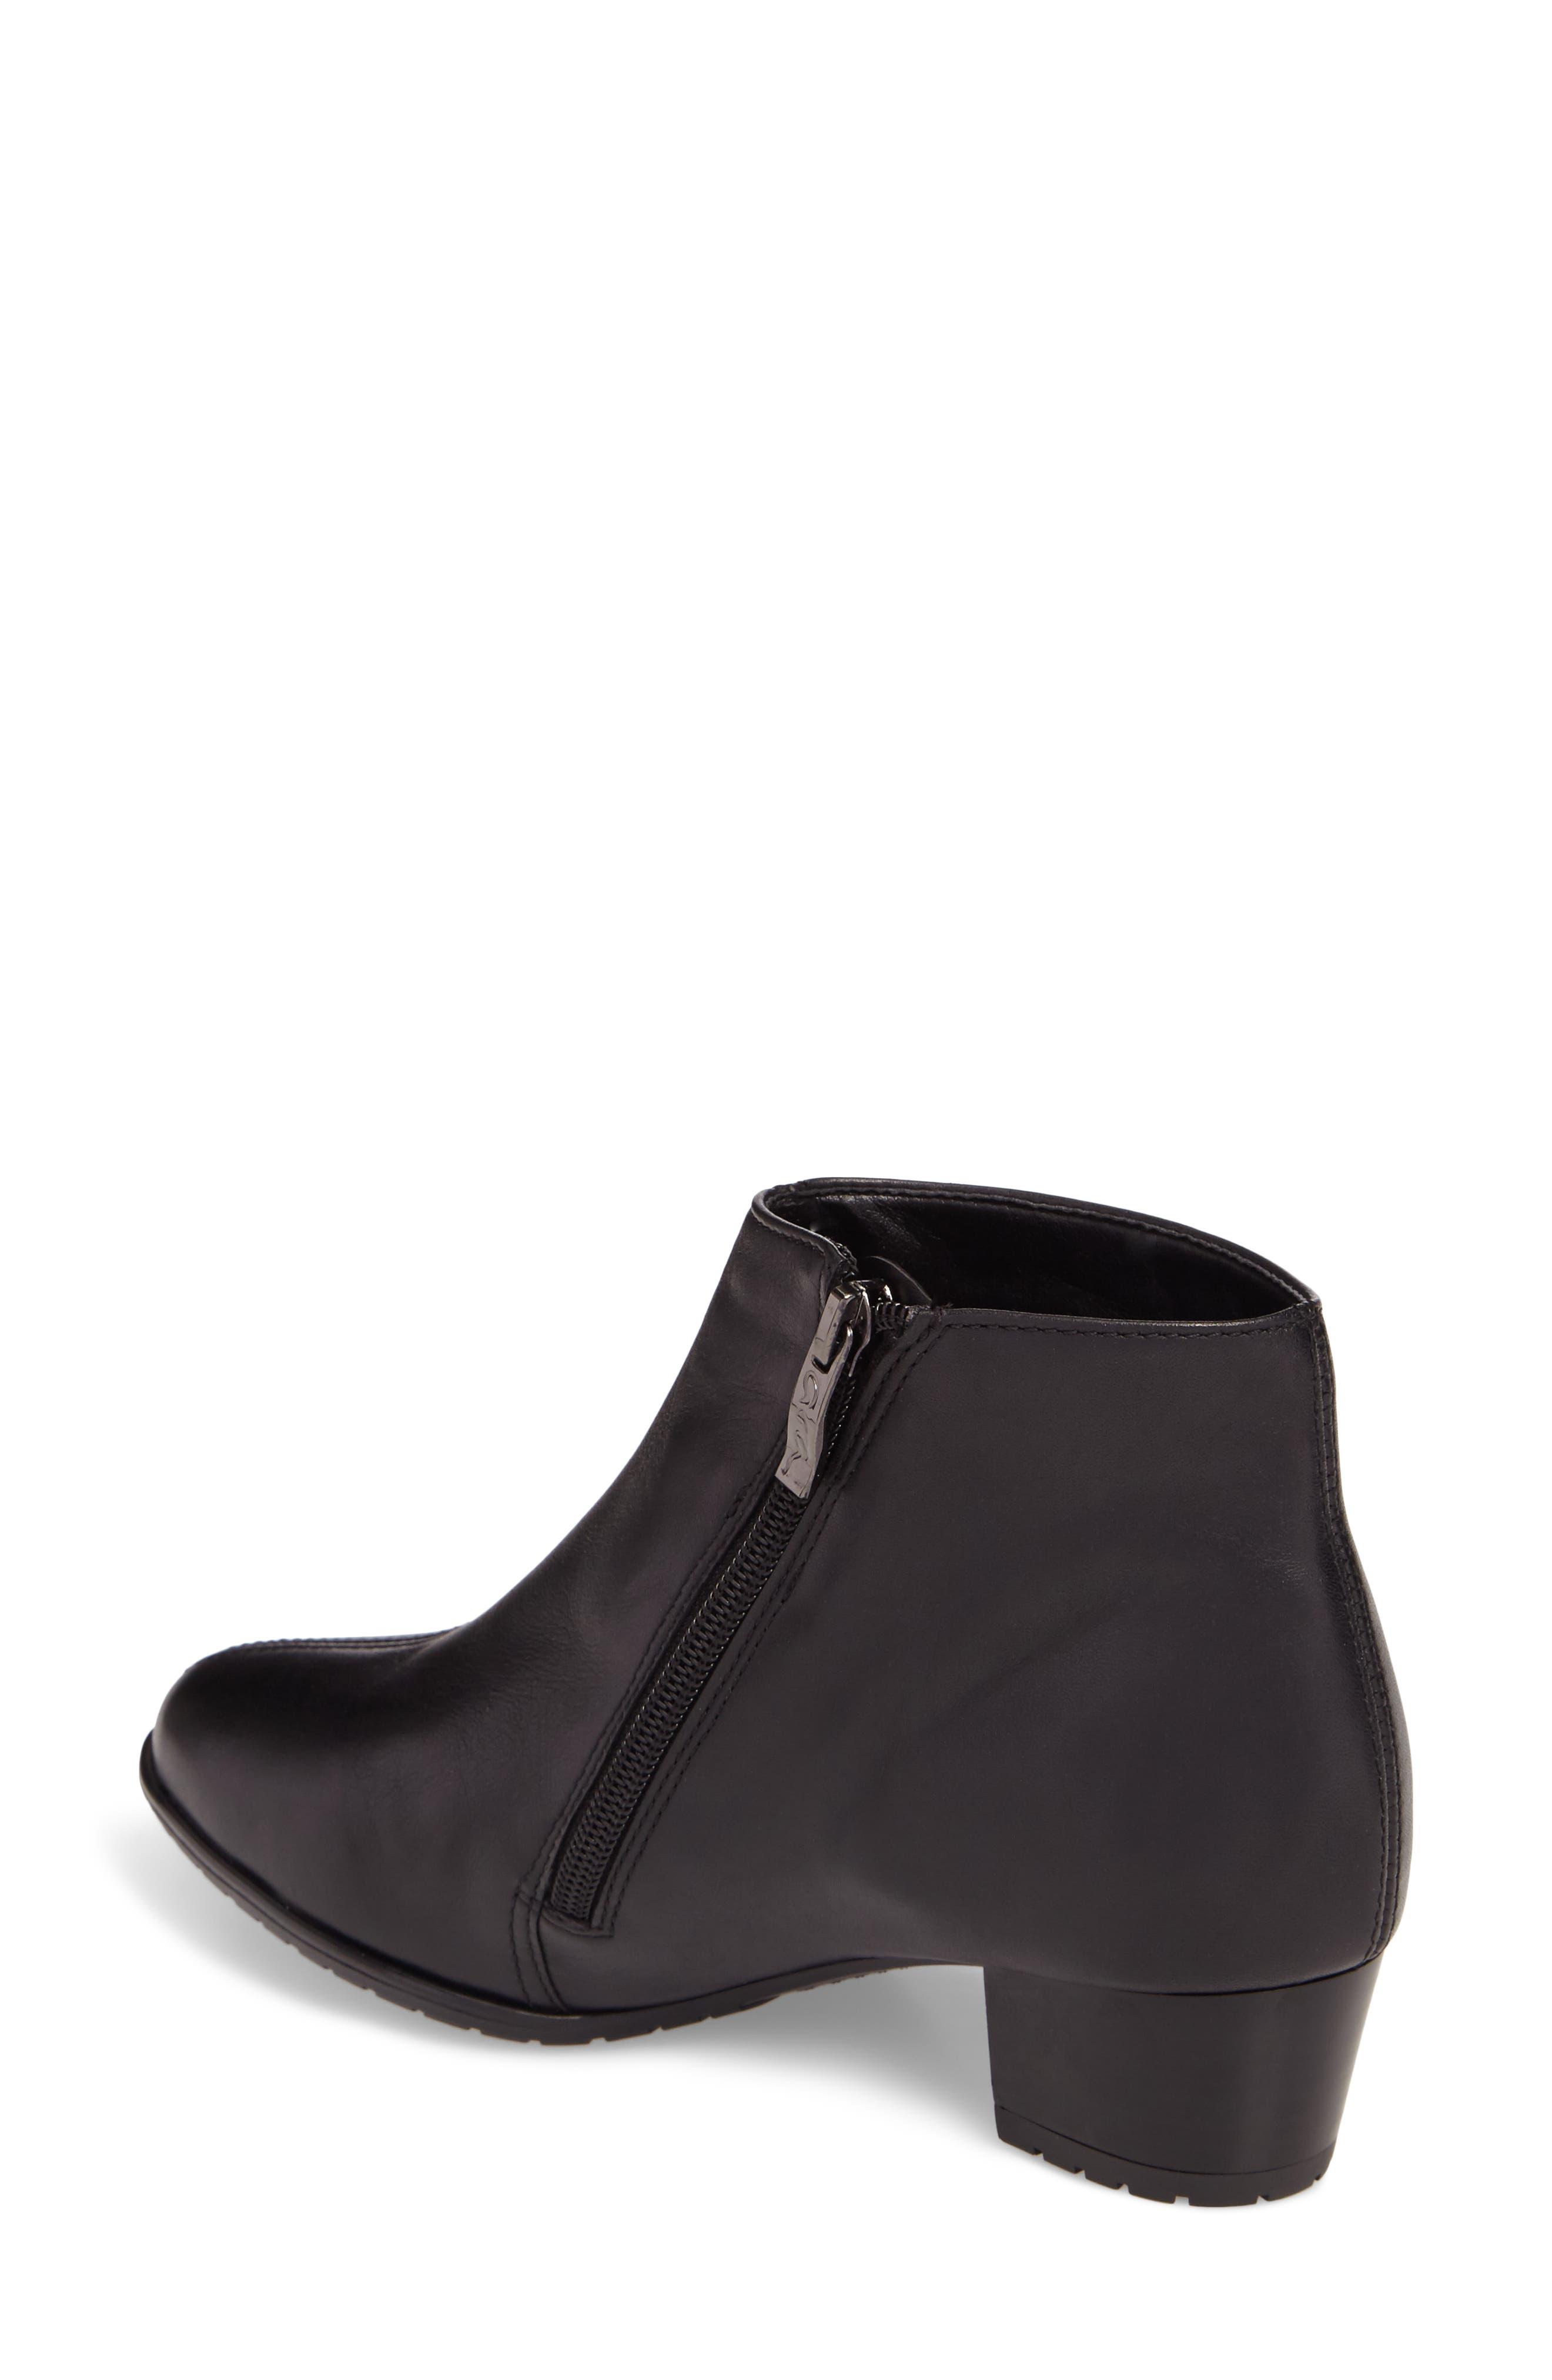 Prisha Waterproof Gore-Tex<sup>®</sup> Bootie,                             Alternate thumbnail 2, color,                             Black Leather